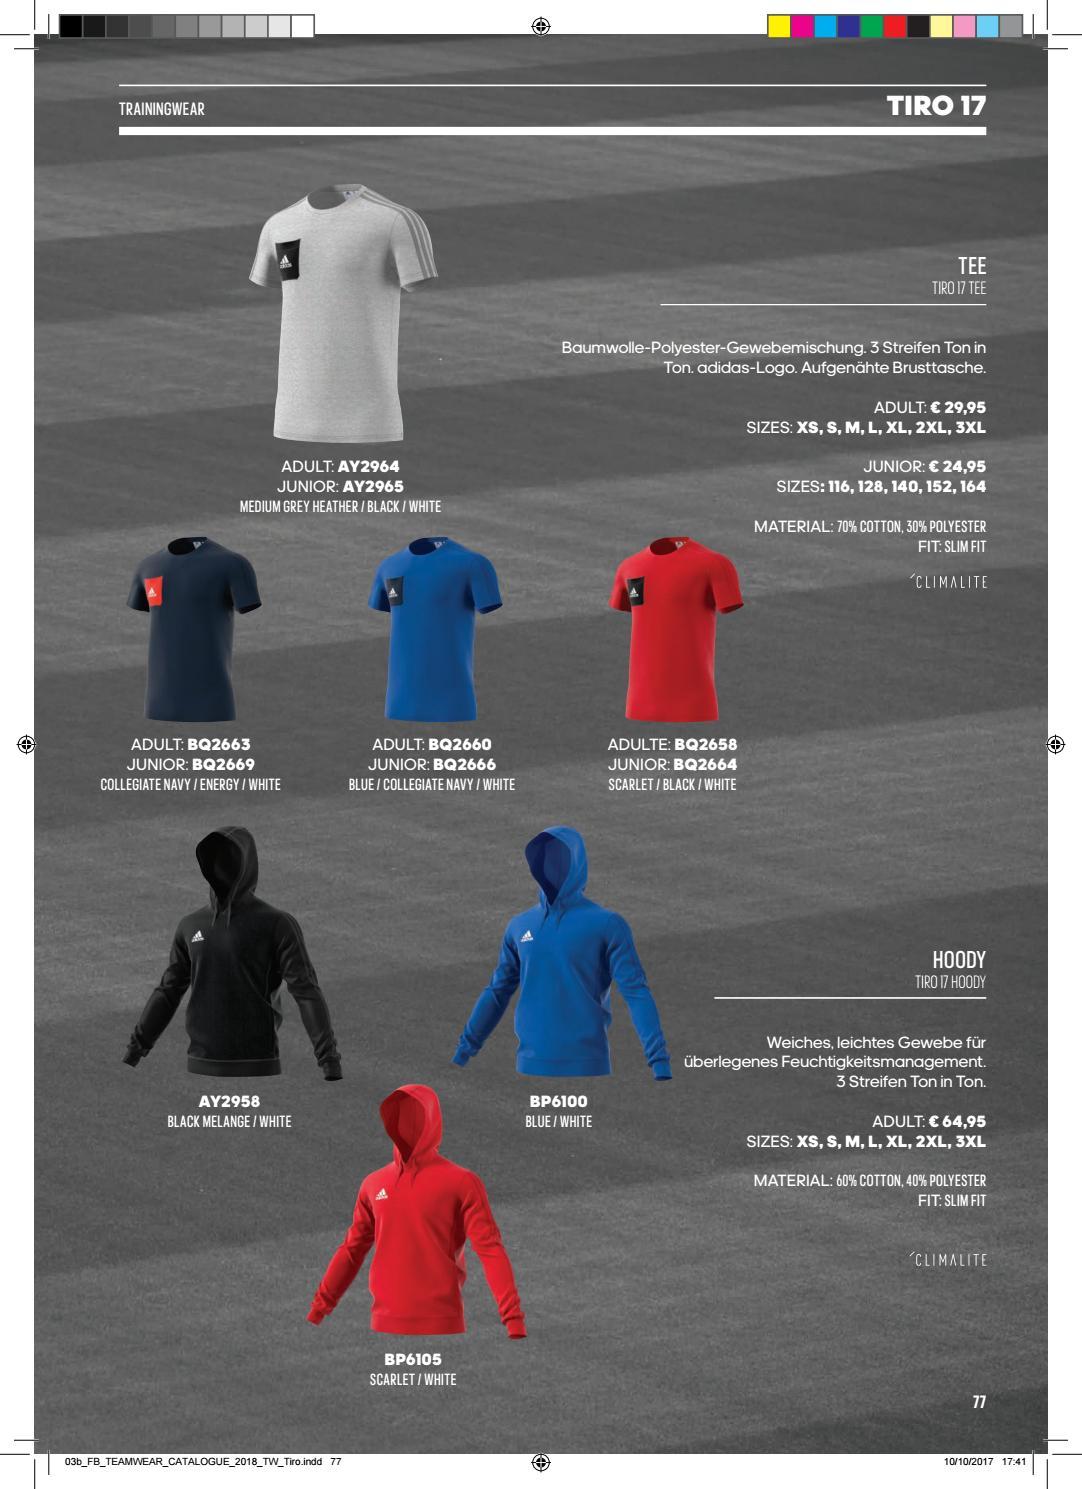 Adidas Teamsport Katalog 2018 by Teamplayer issuu